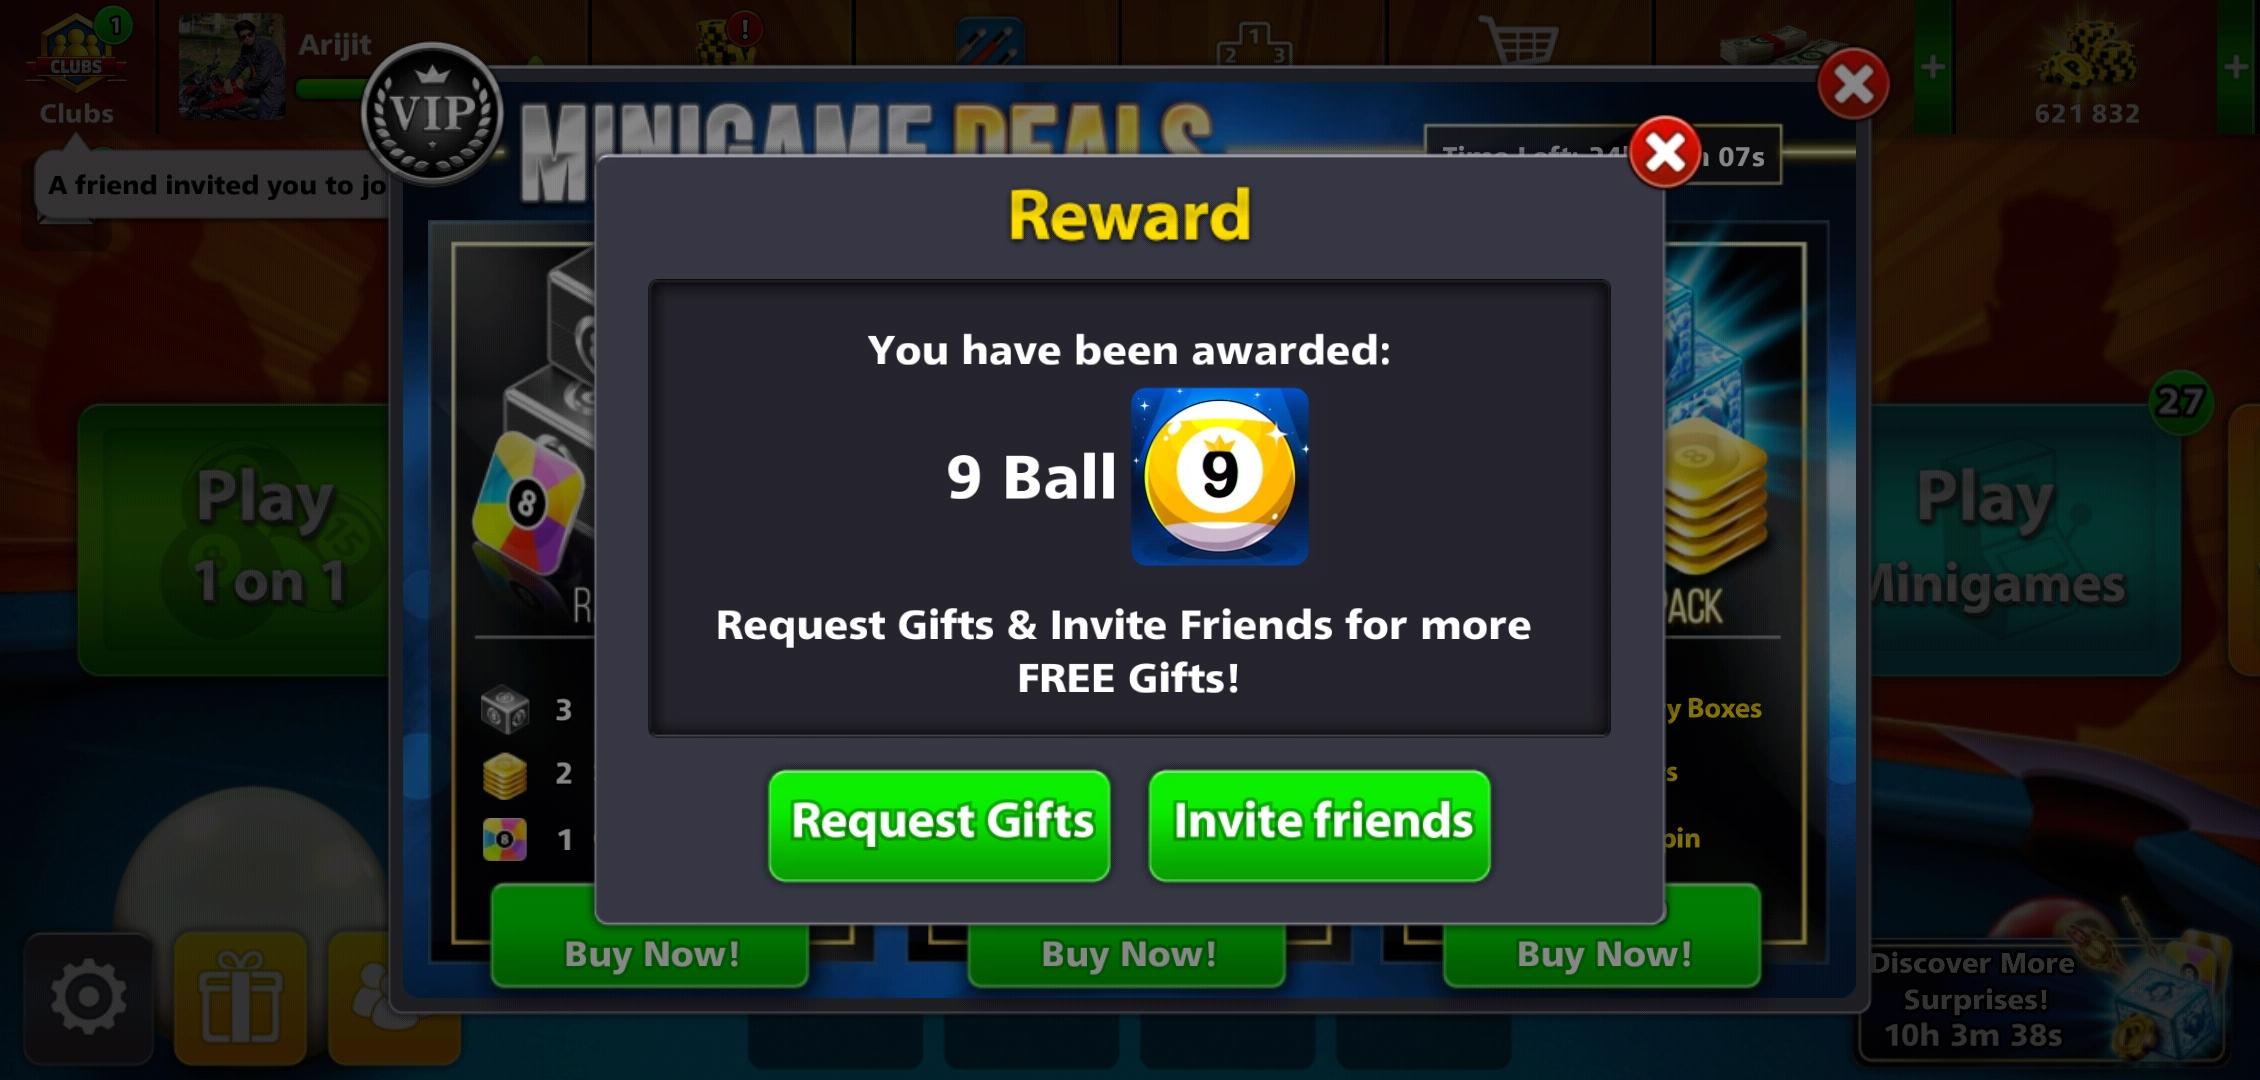 8Ball Pool Reward Links